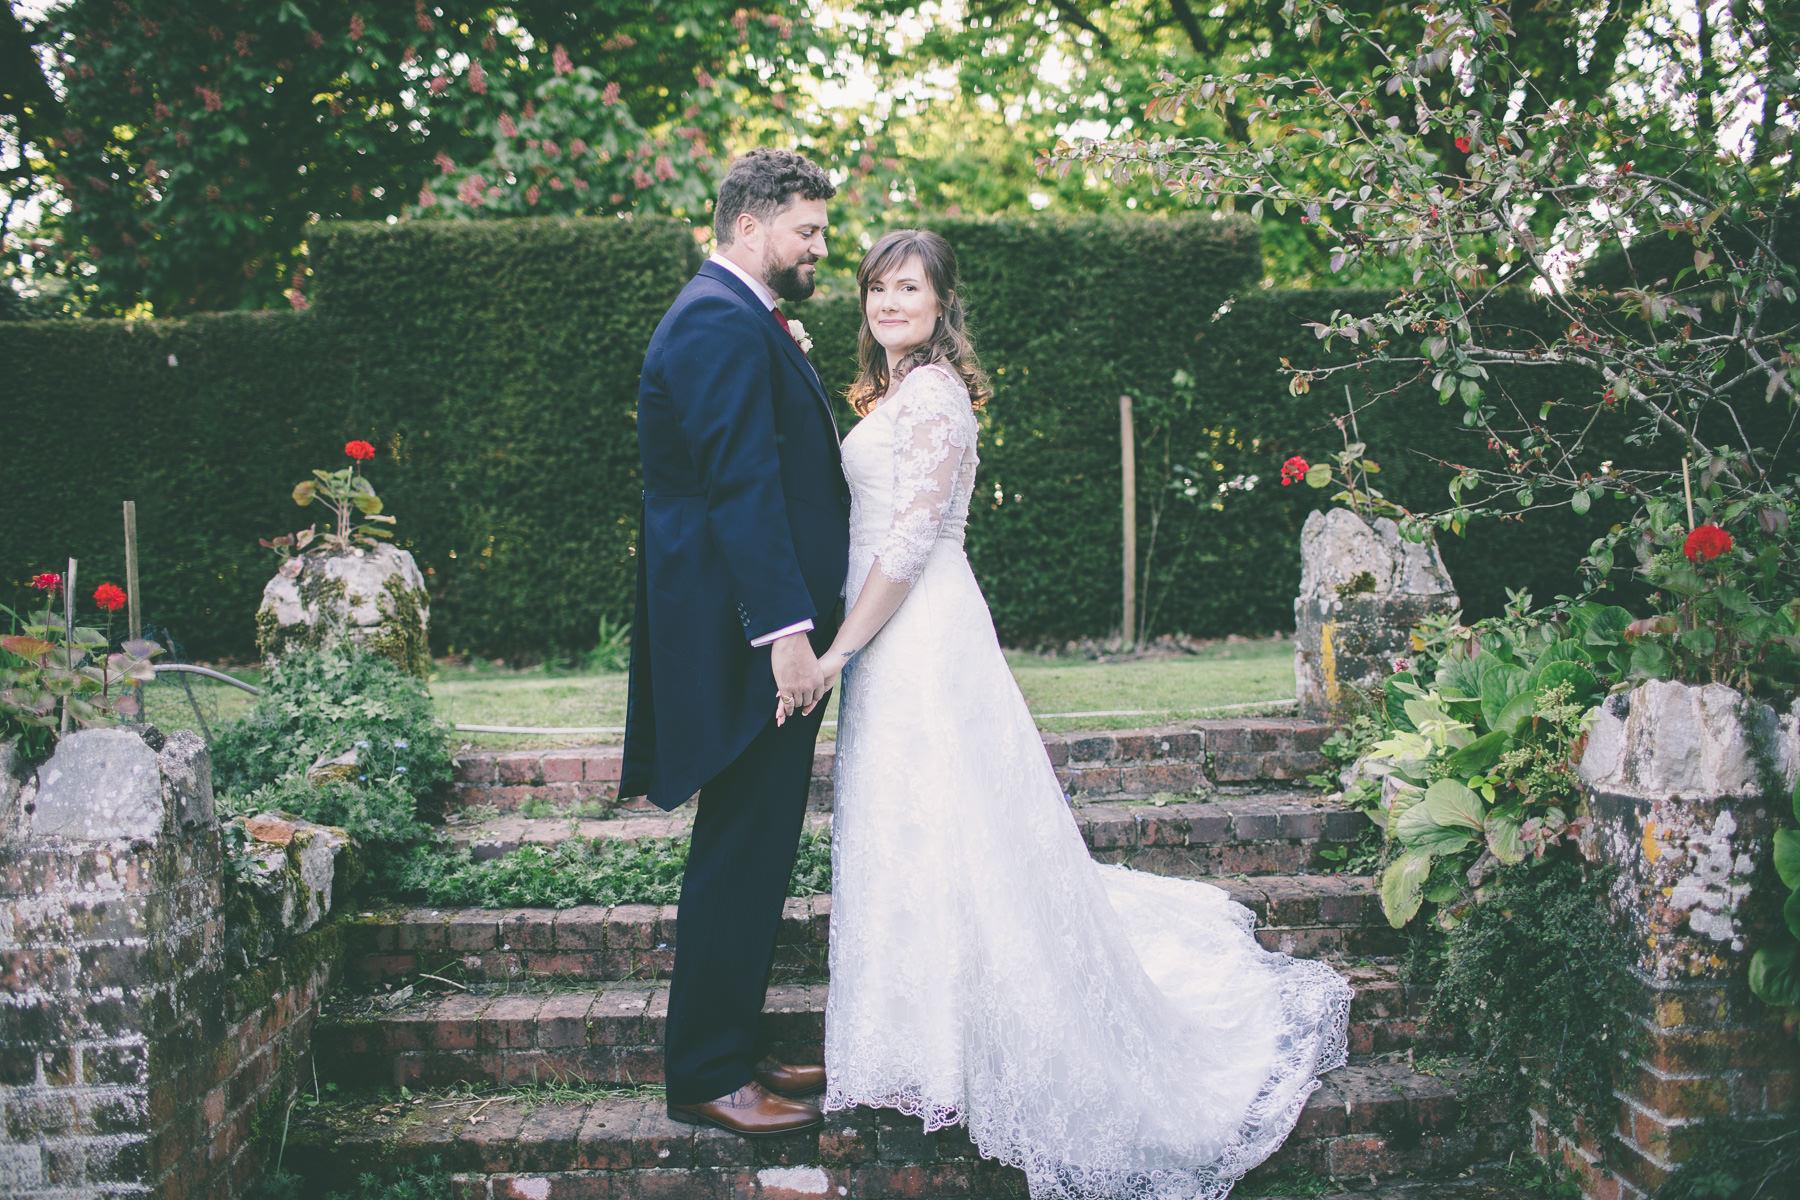 Pamber-Place-wedding-photography-basingstoke-hampshire-193